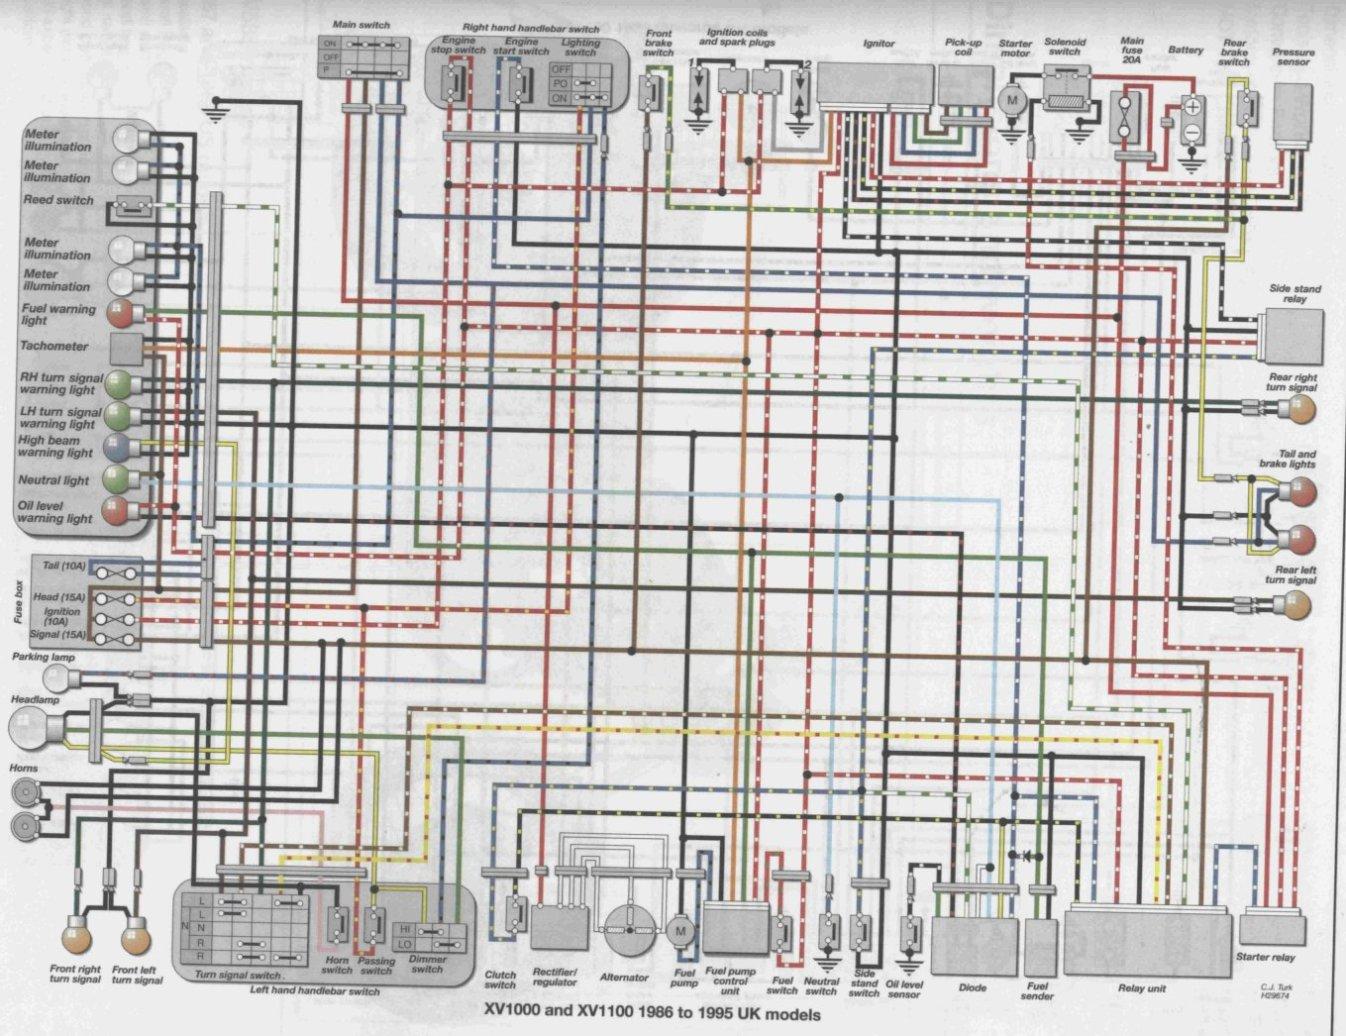 yamaha virago wiring diagram yamaha image wiring 1994 yamaha 750 virago wiring diagram 1994 auto wiring diagram on yamaha virago wiring diagram